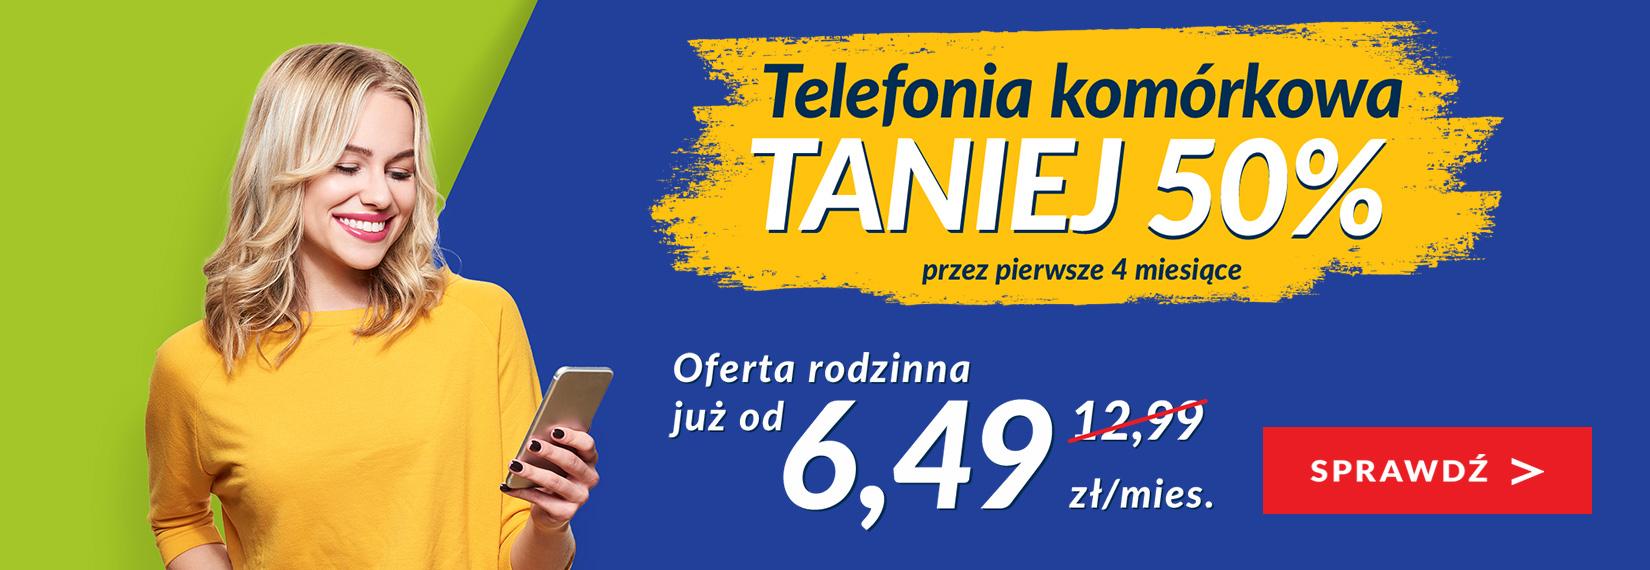 Oferty mobilne